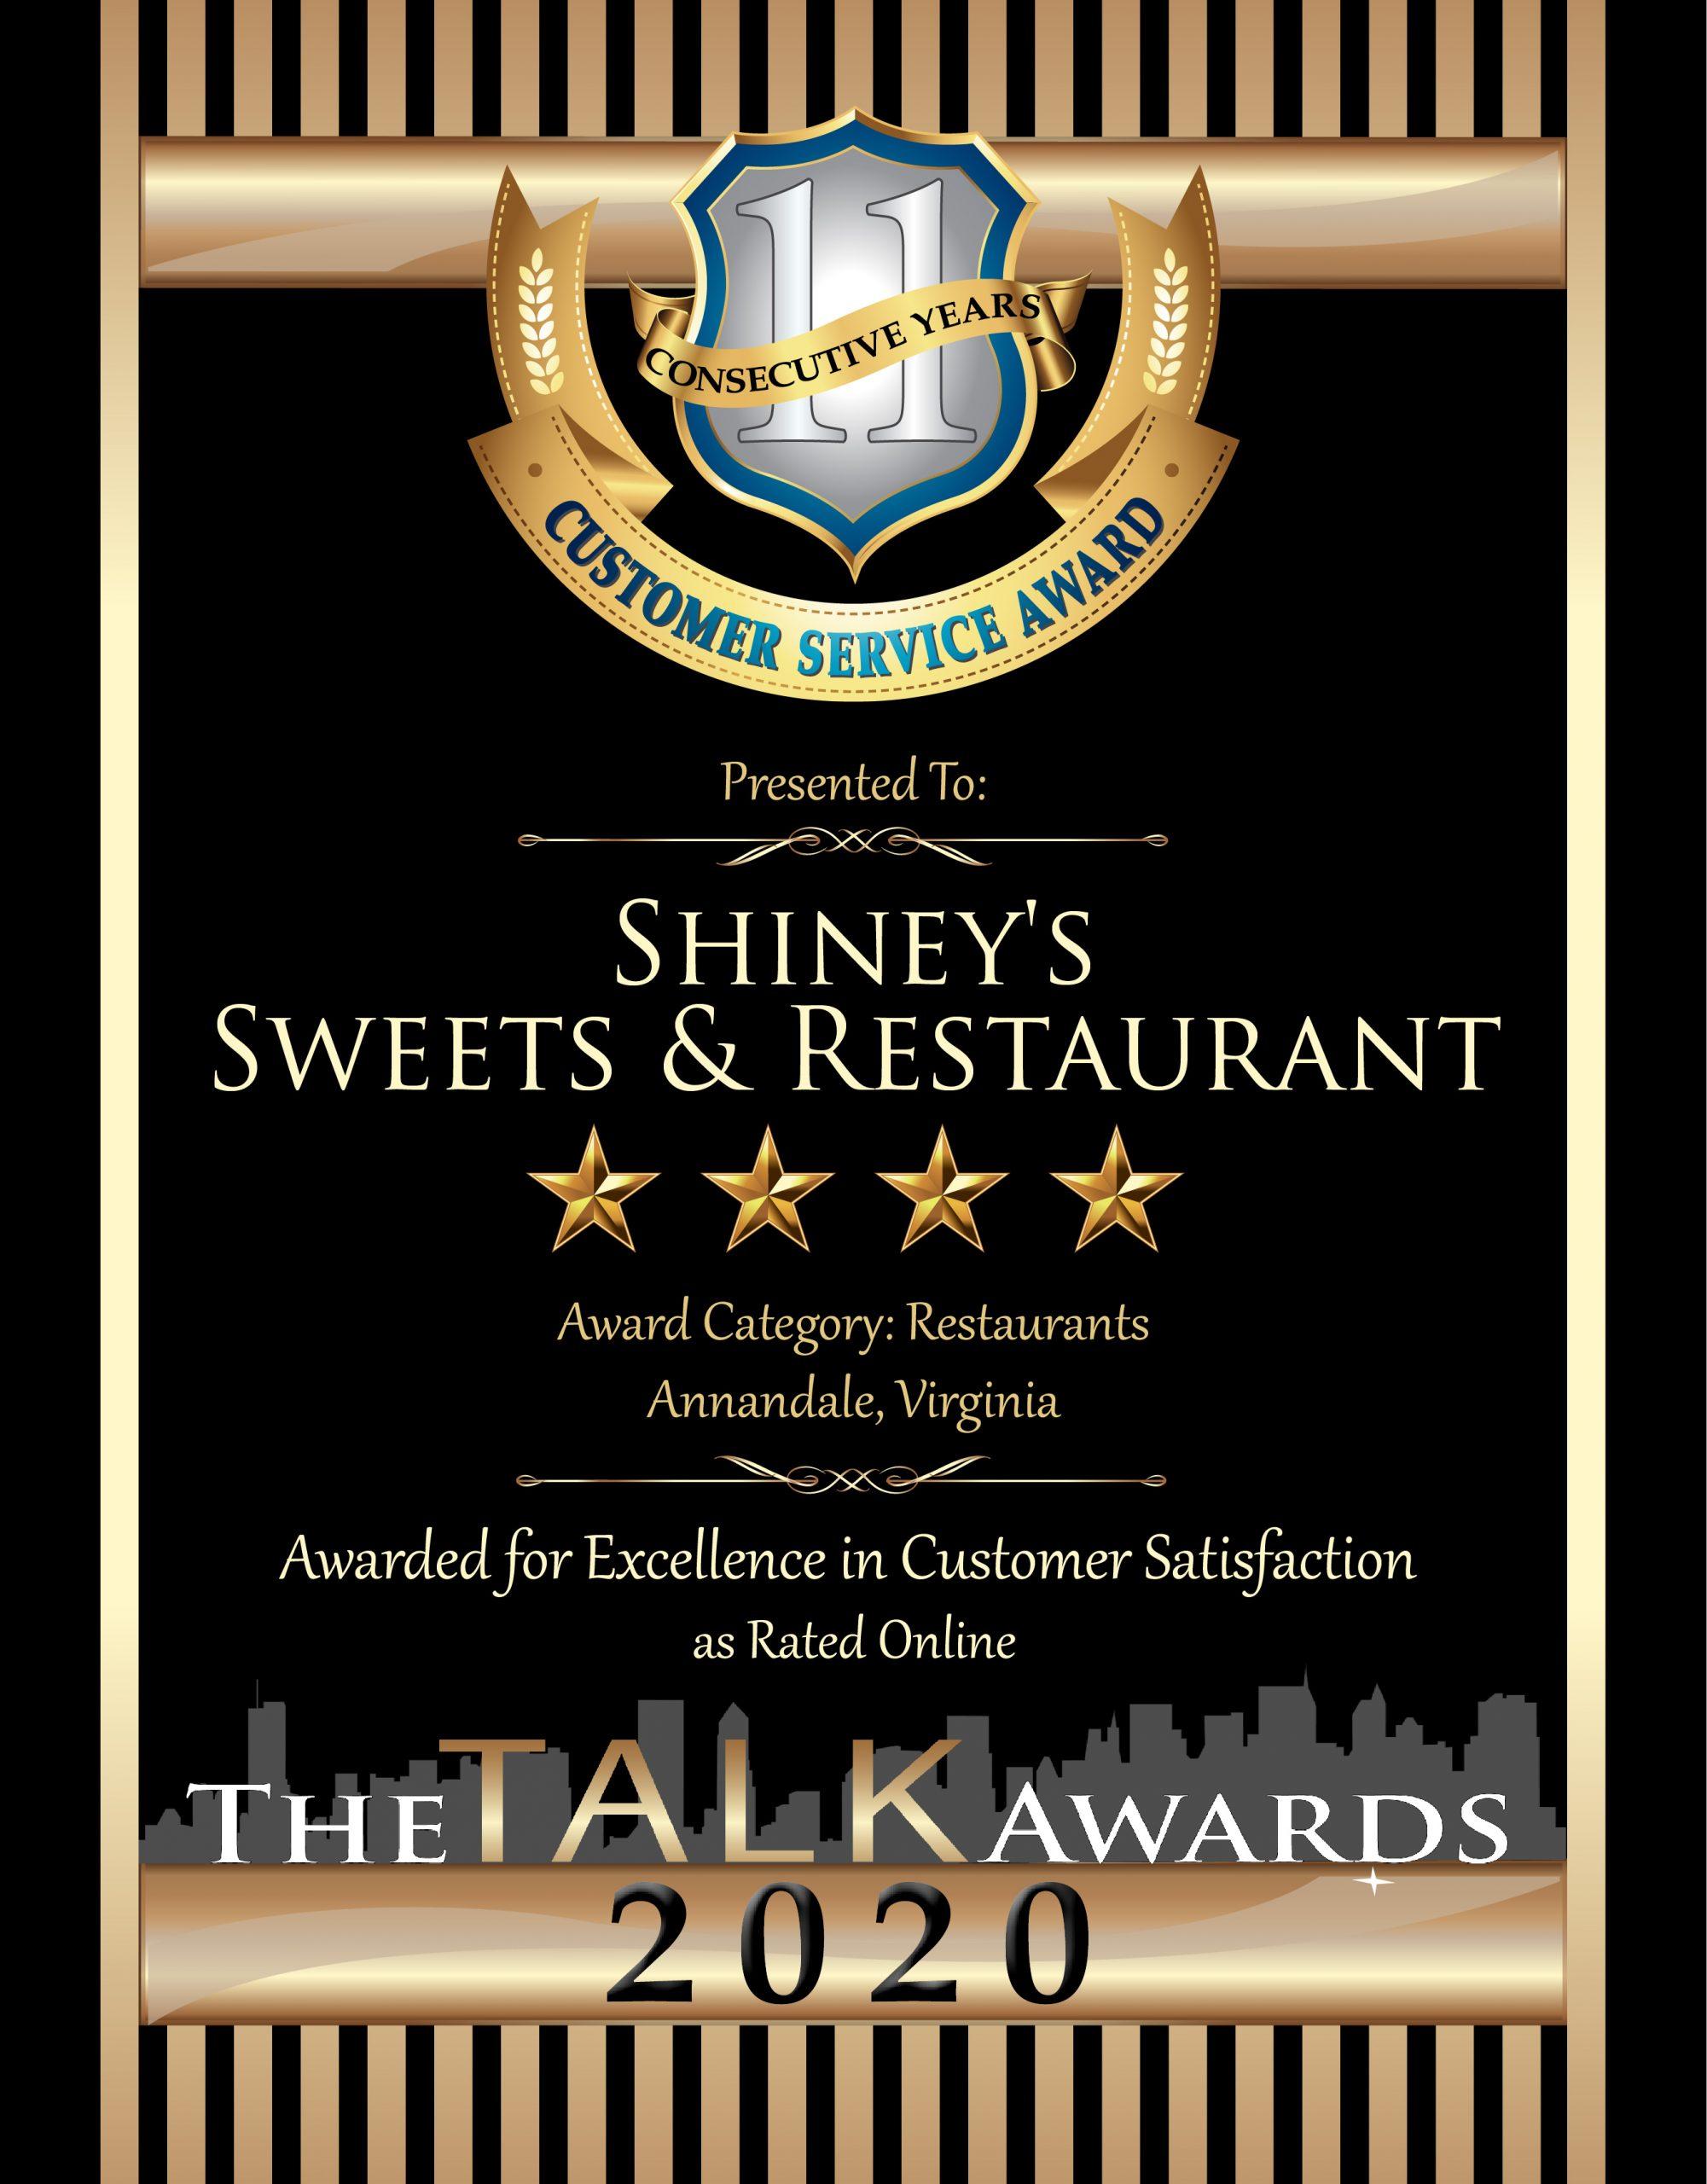 Shiney's Sweets & Restaurant wins 2020 Talk Award